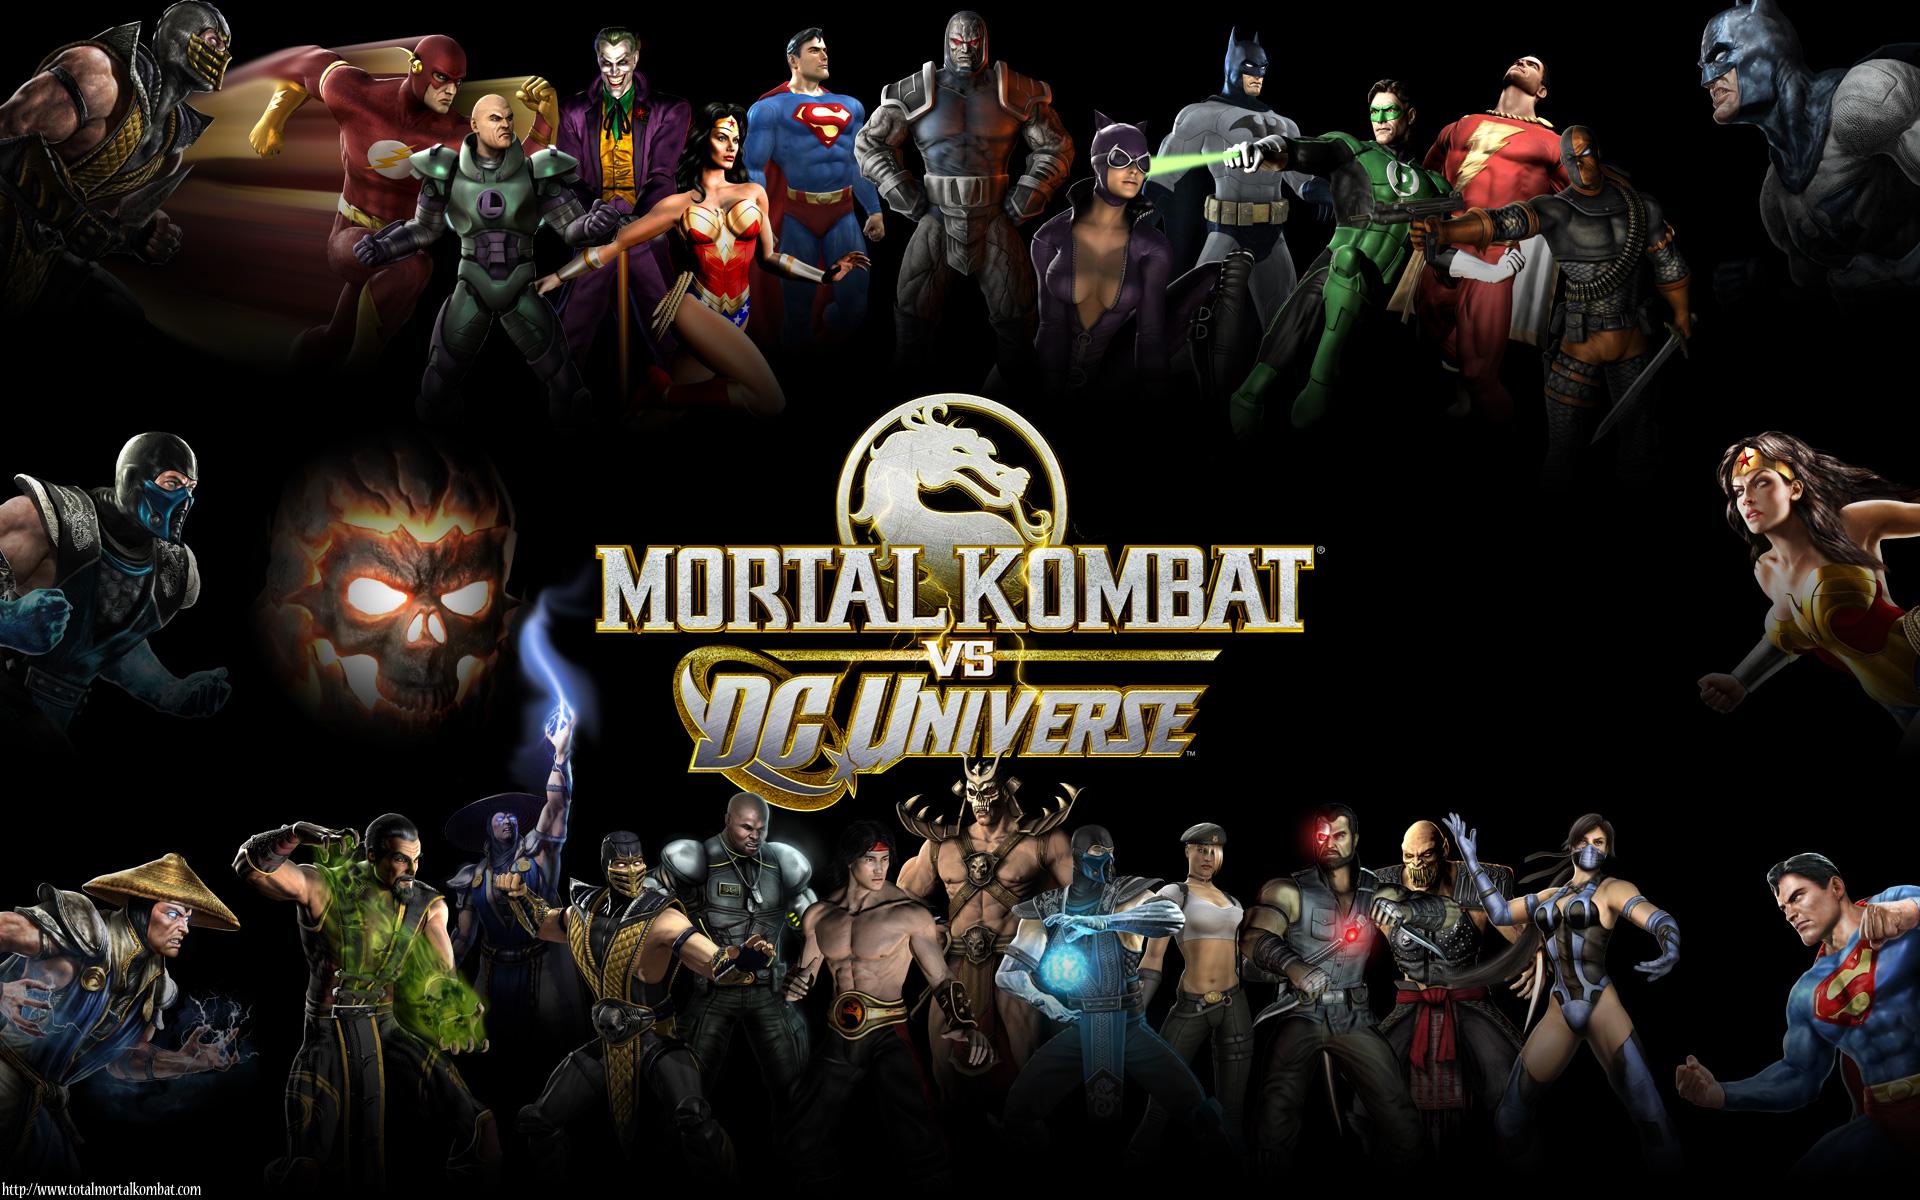 Cool Mortal Kombat Wallpaper 472 Wallpapers Coolz HD Wallpaper 1920x1200